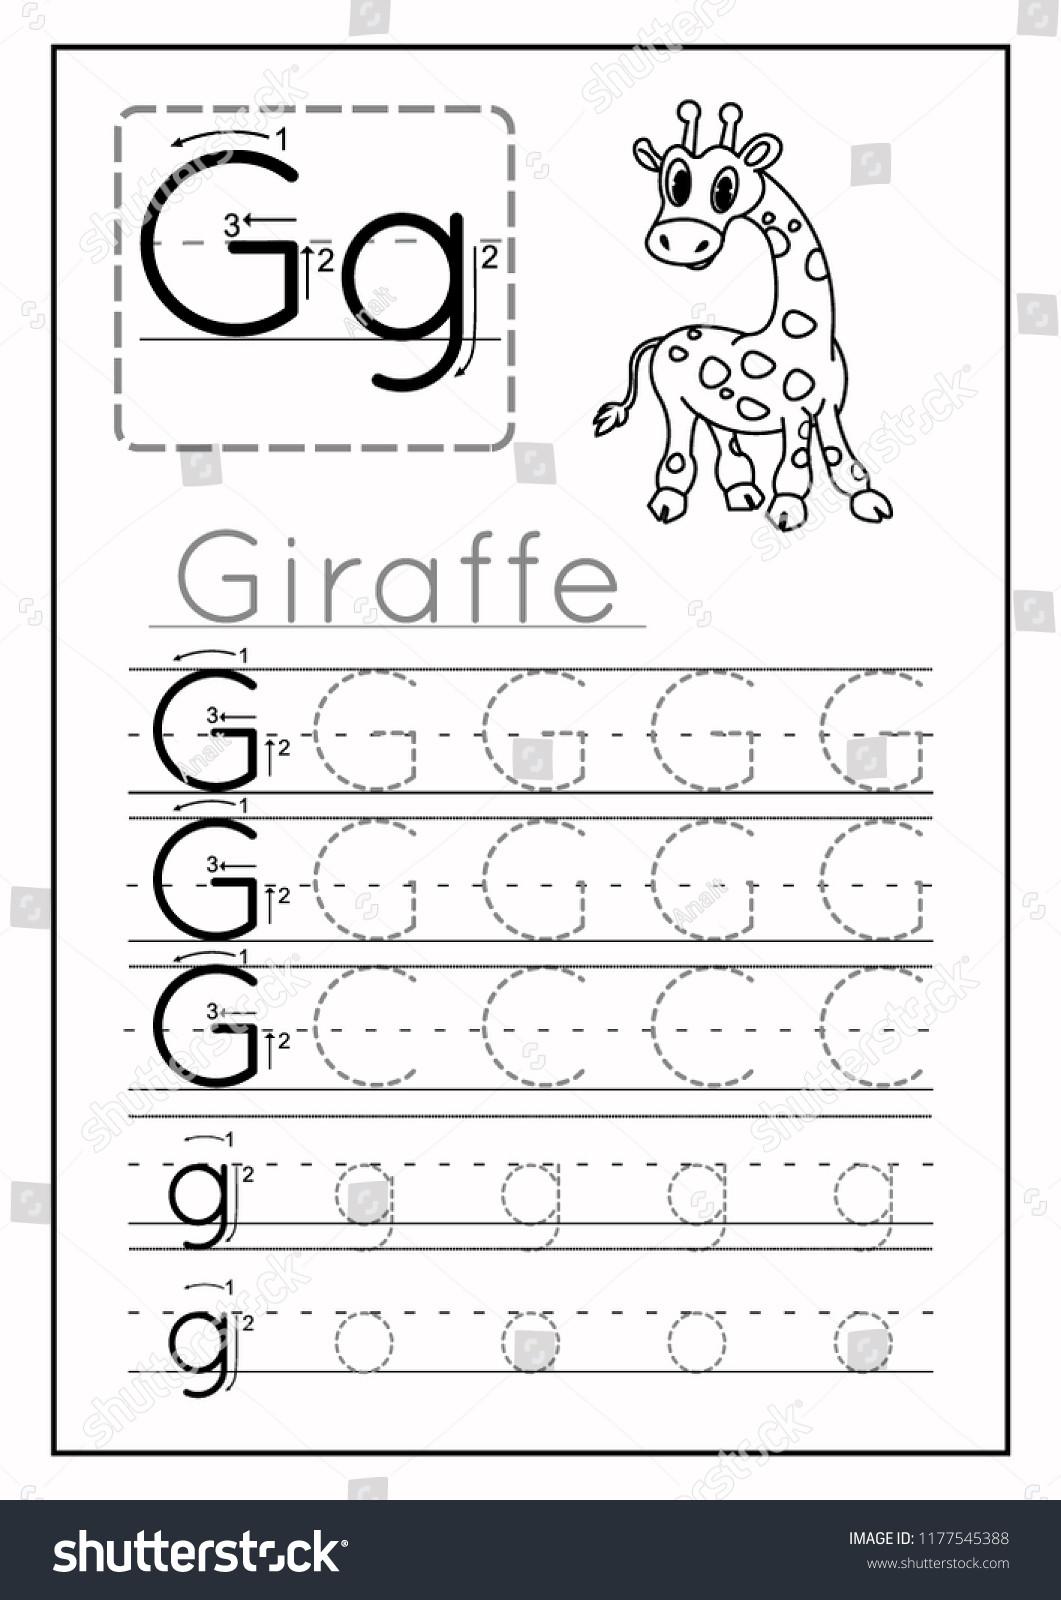 Letter G Worksheets for Kindergarten Writing Practice Letter G Printable Worksheet เวกเตอร์สต็อก